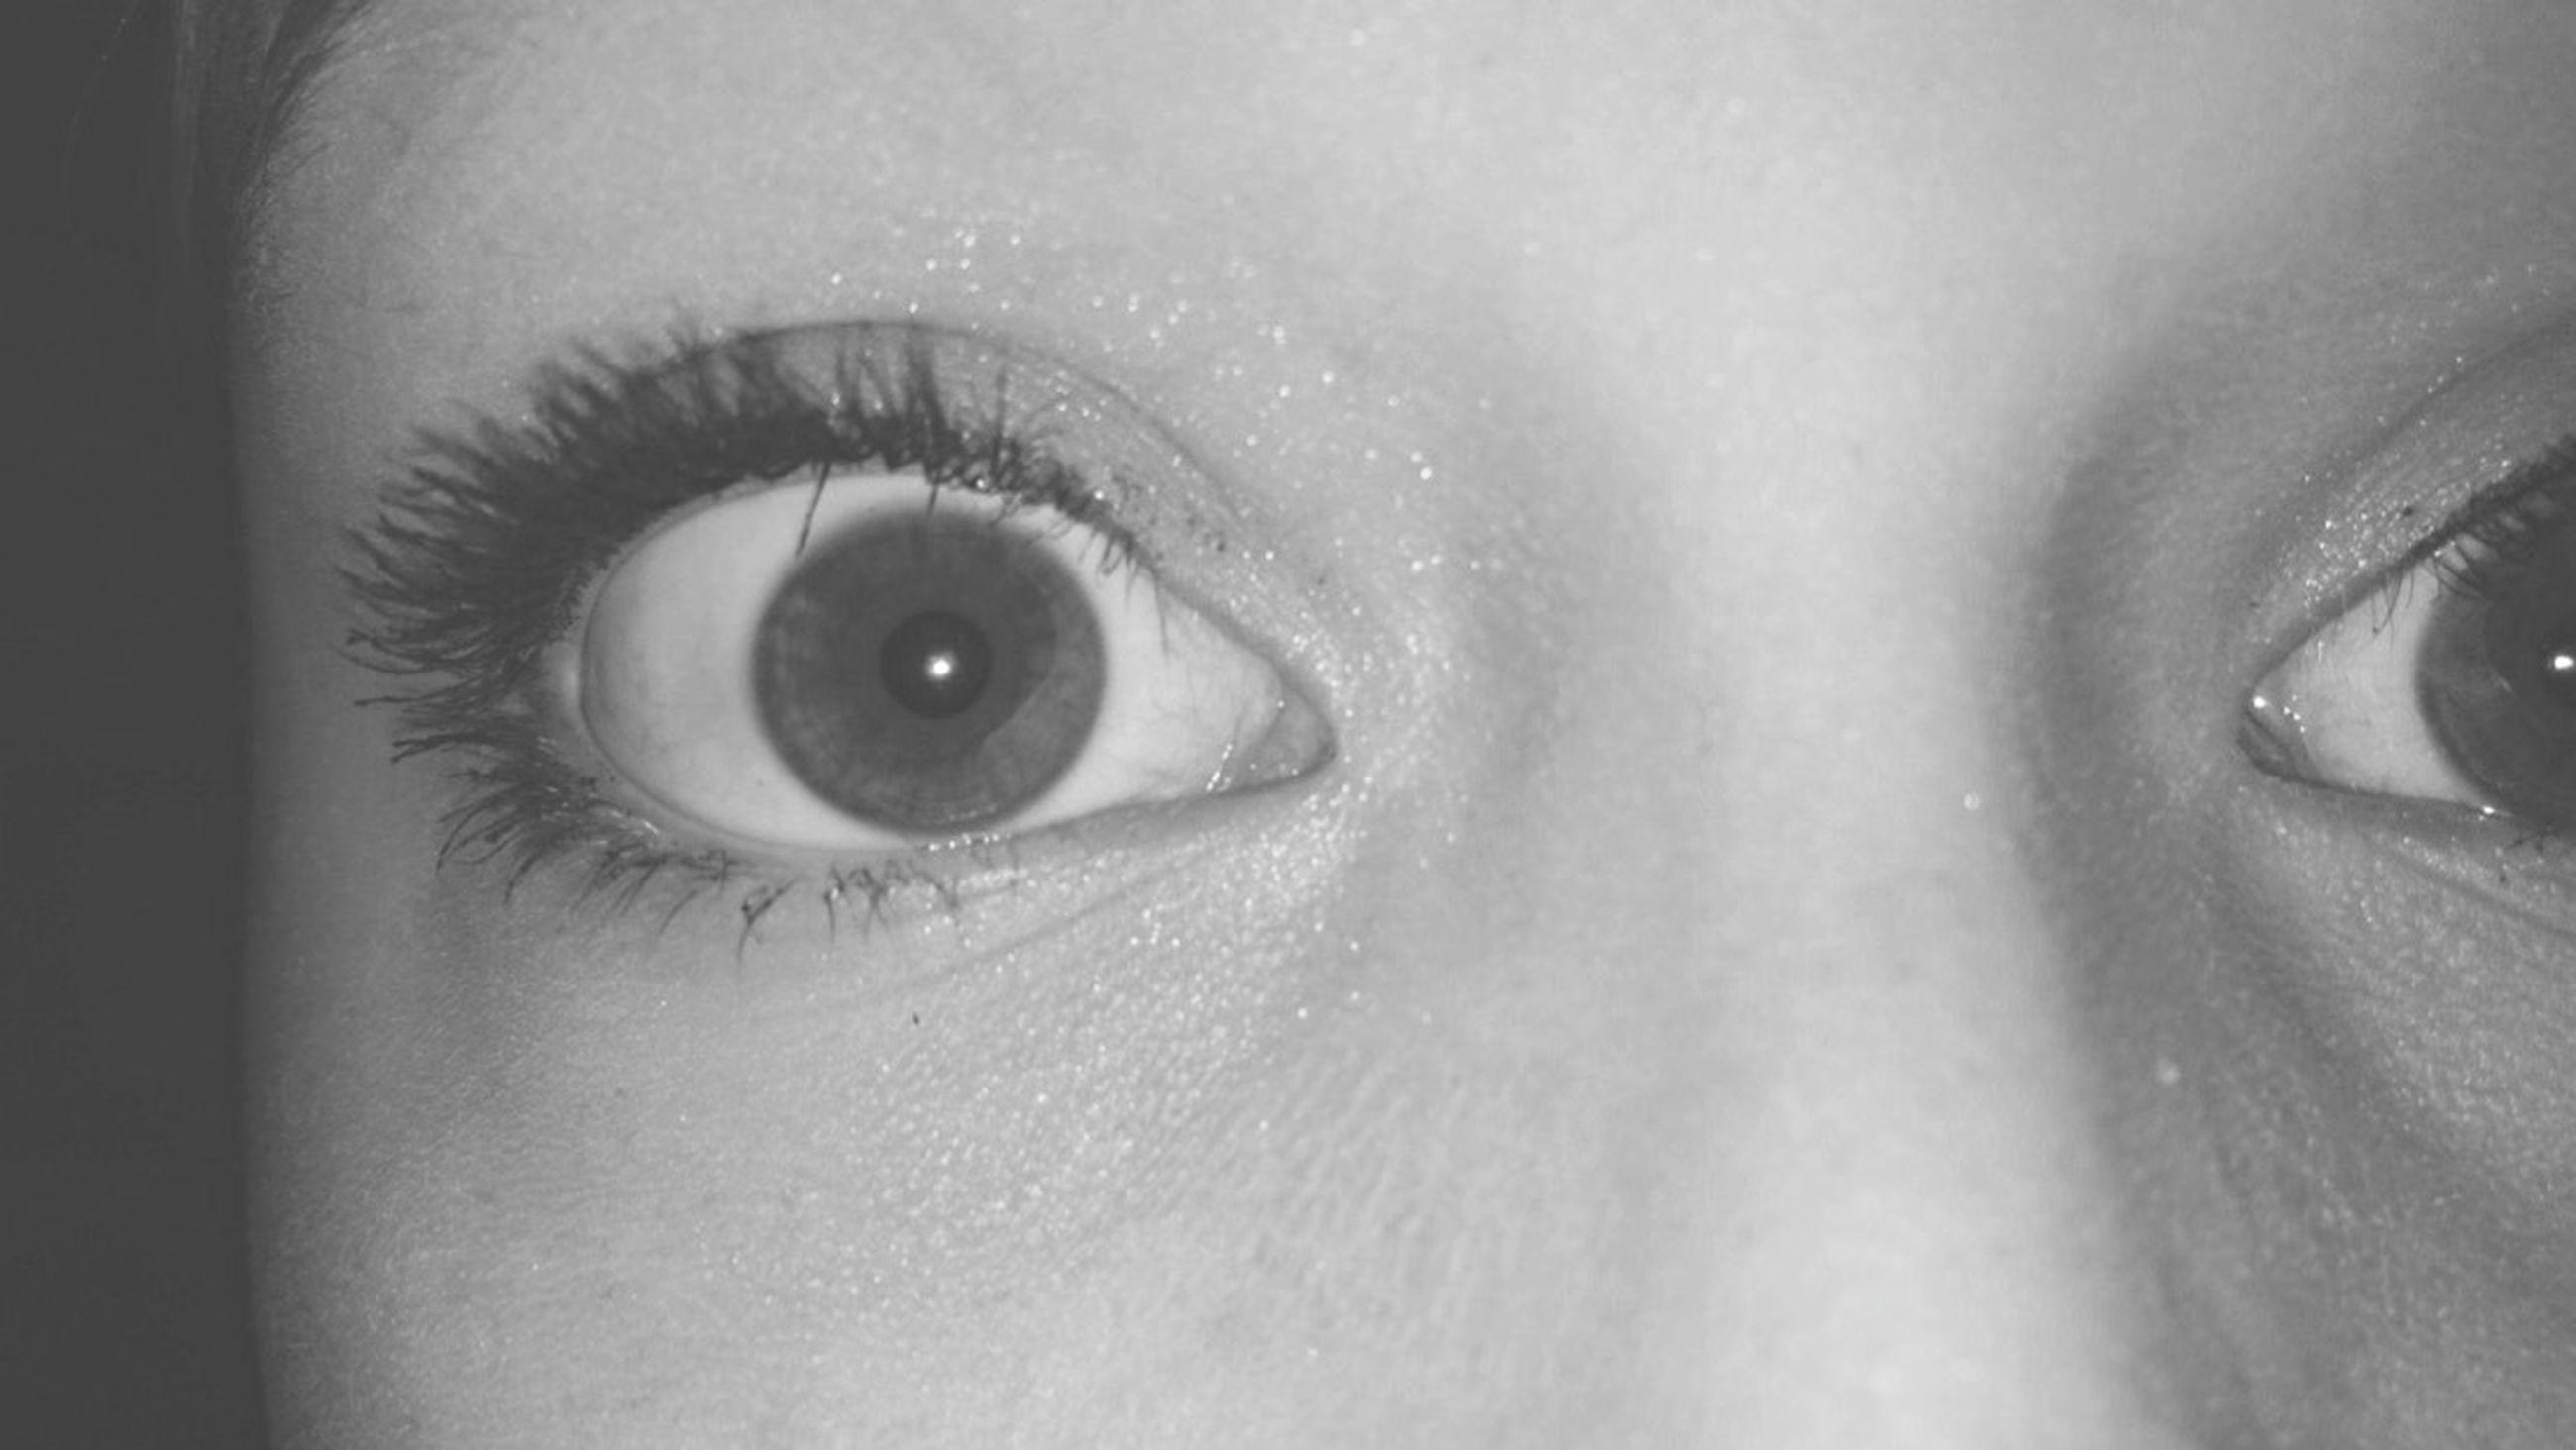 human eye, close-up, eyelash, indoors, looking at camera, human skin, part of, lifestyles, eyesight, portrait, human face, sensory perception, person, extreme close-up, headshot, young adult, eyeball